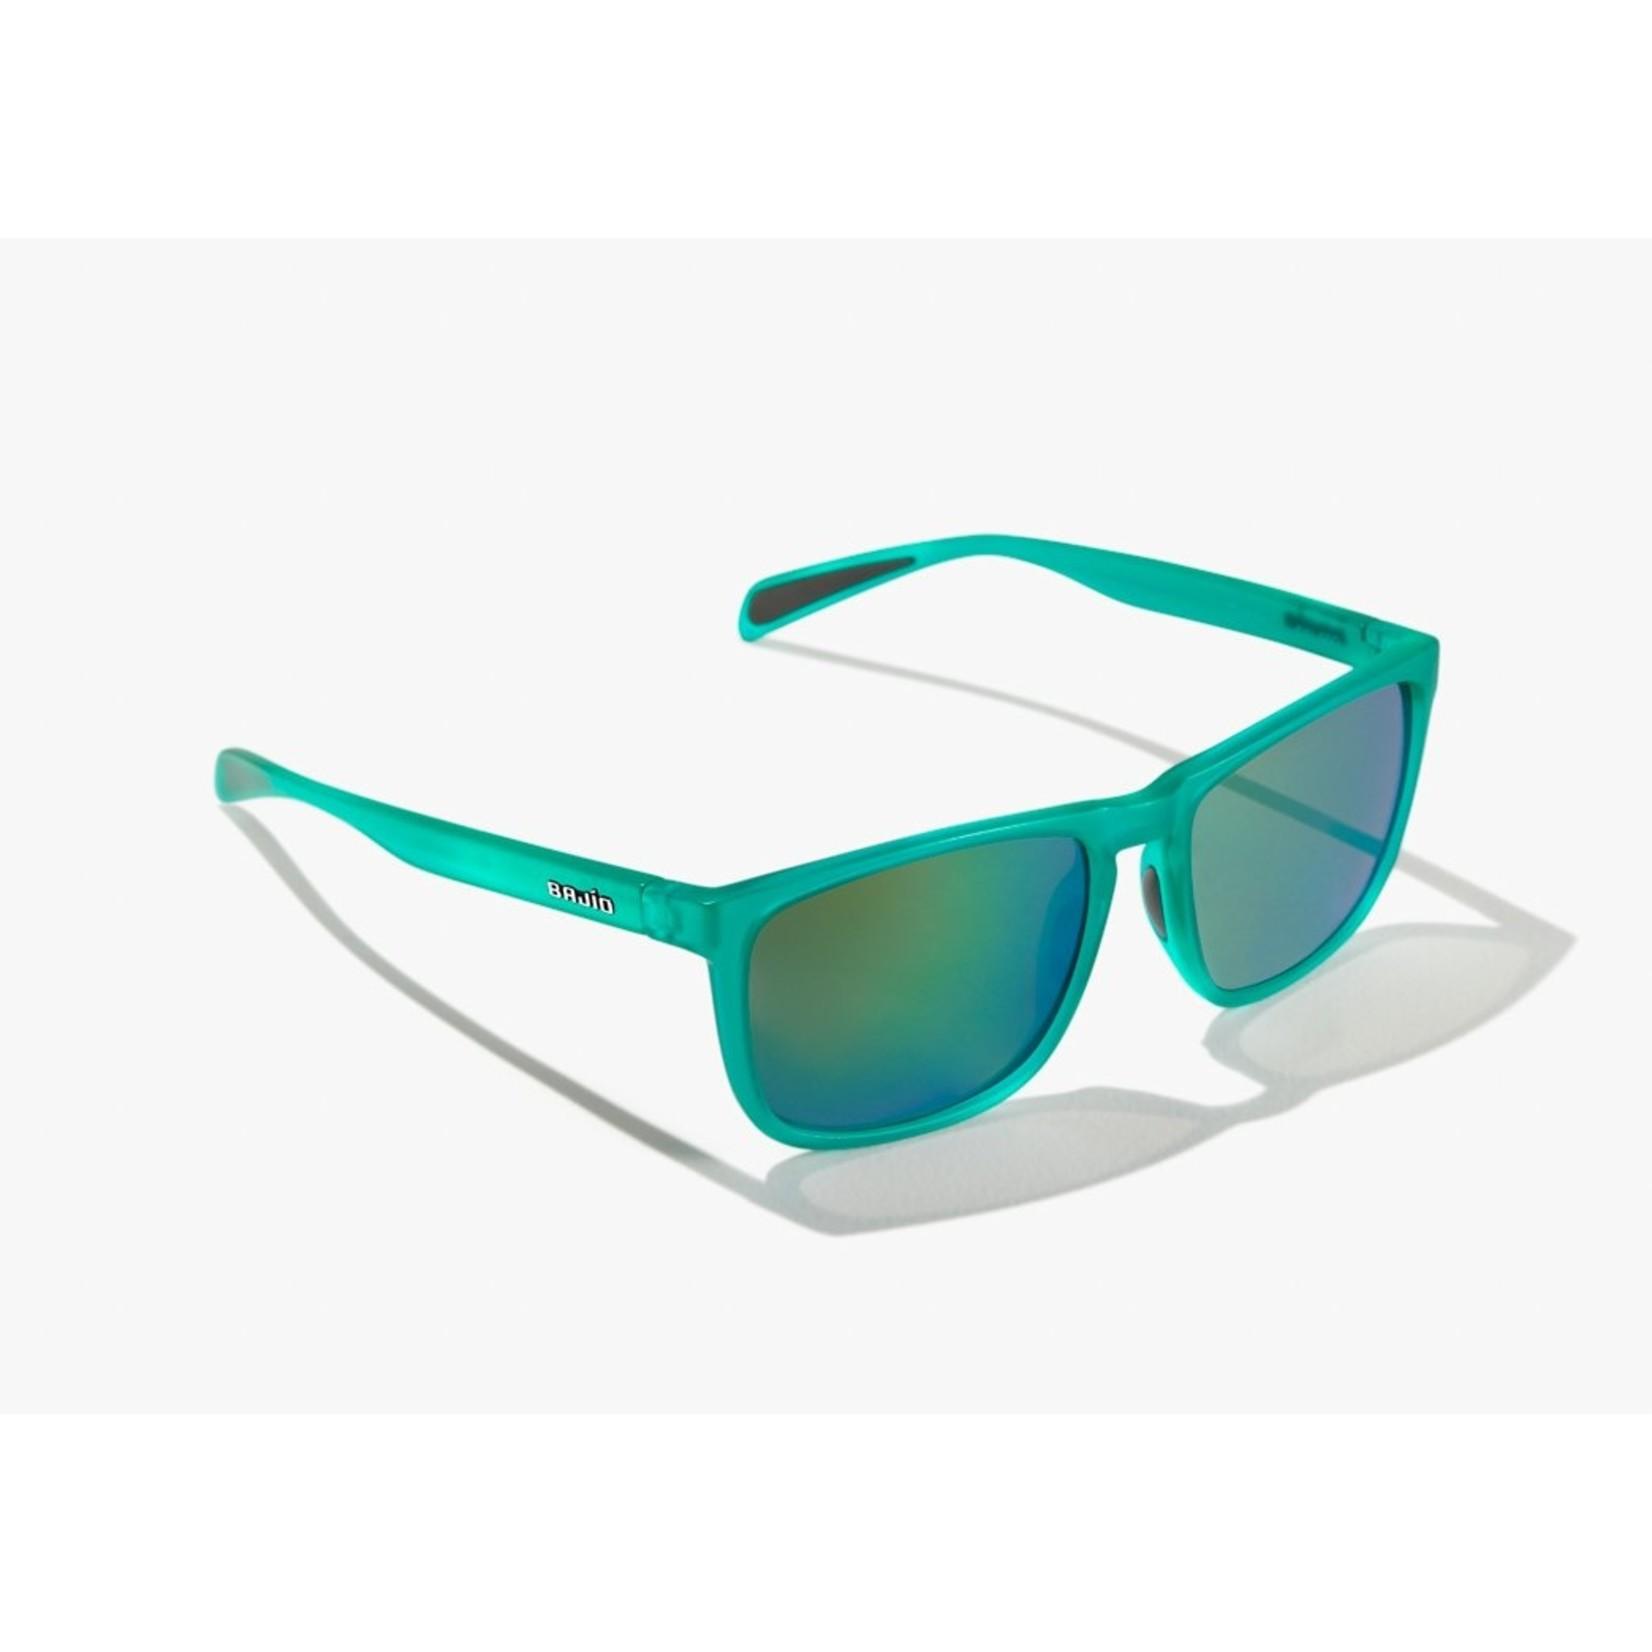 Bajio Bajio Calda Polarized Sunglasses